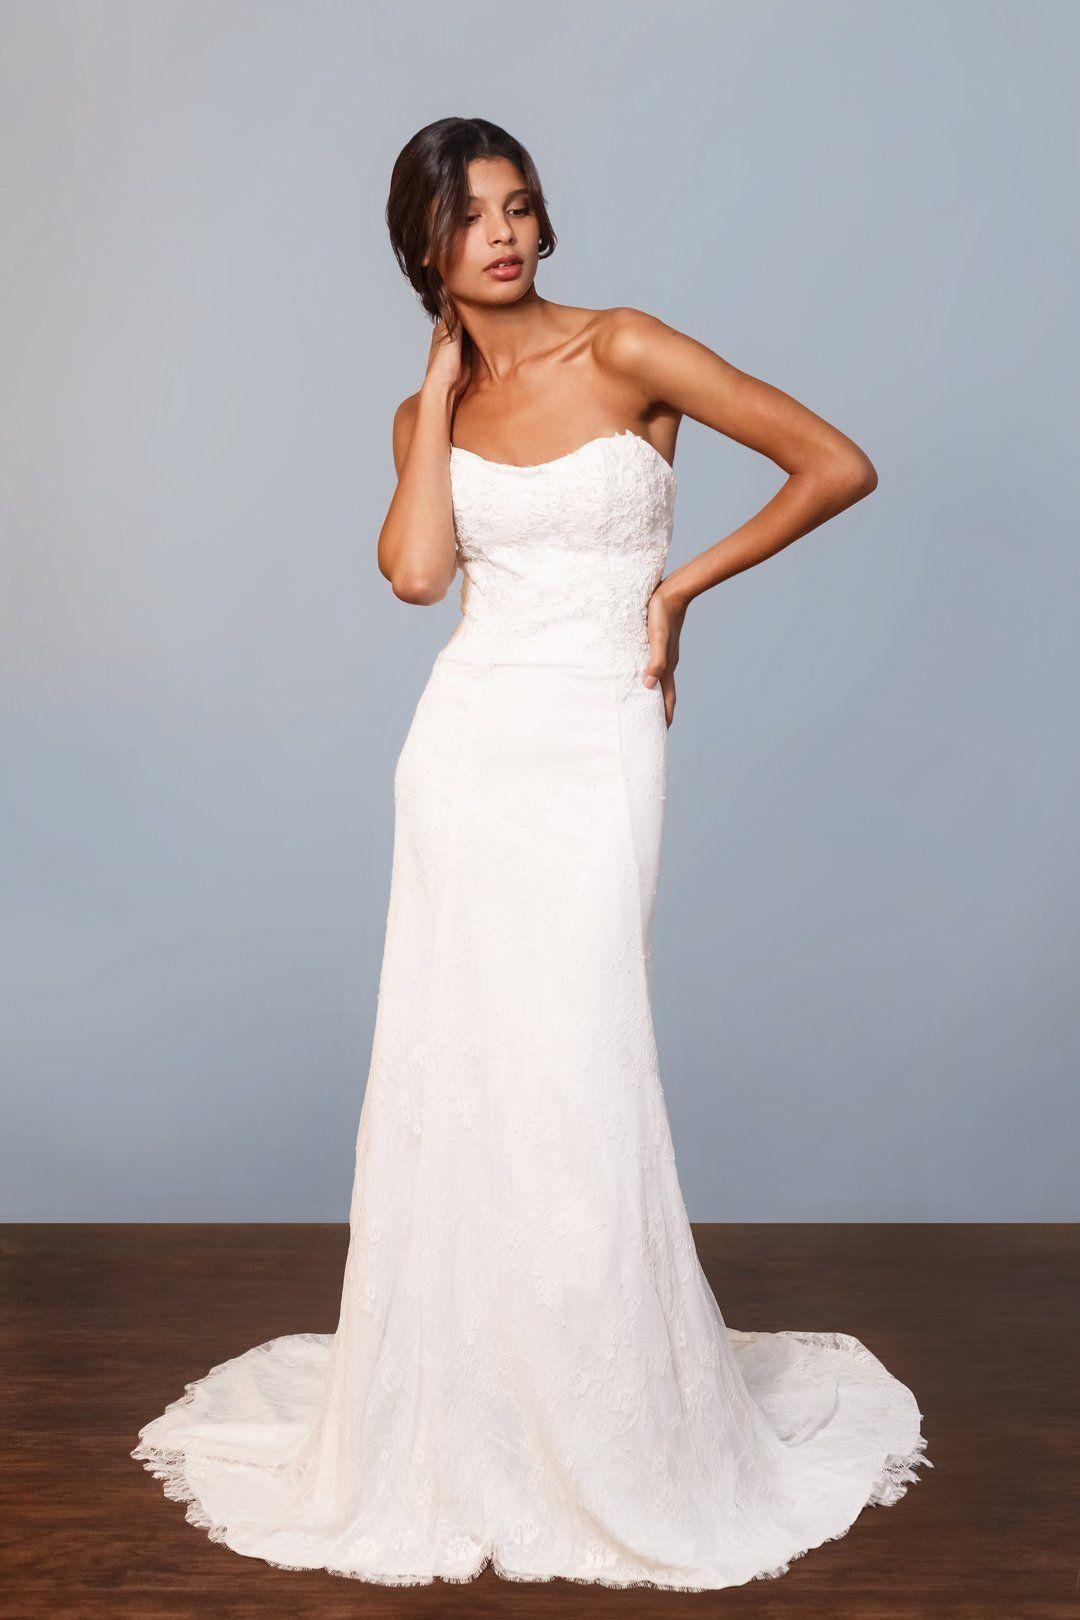 Celia Grace Fair Trade strapless wedding dress all lace | Conscious ...